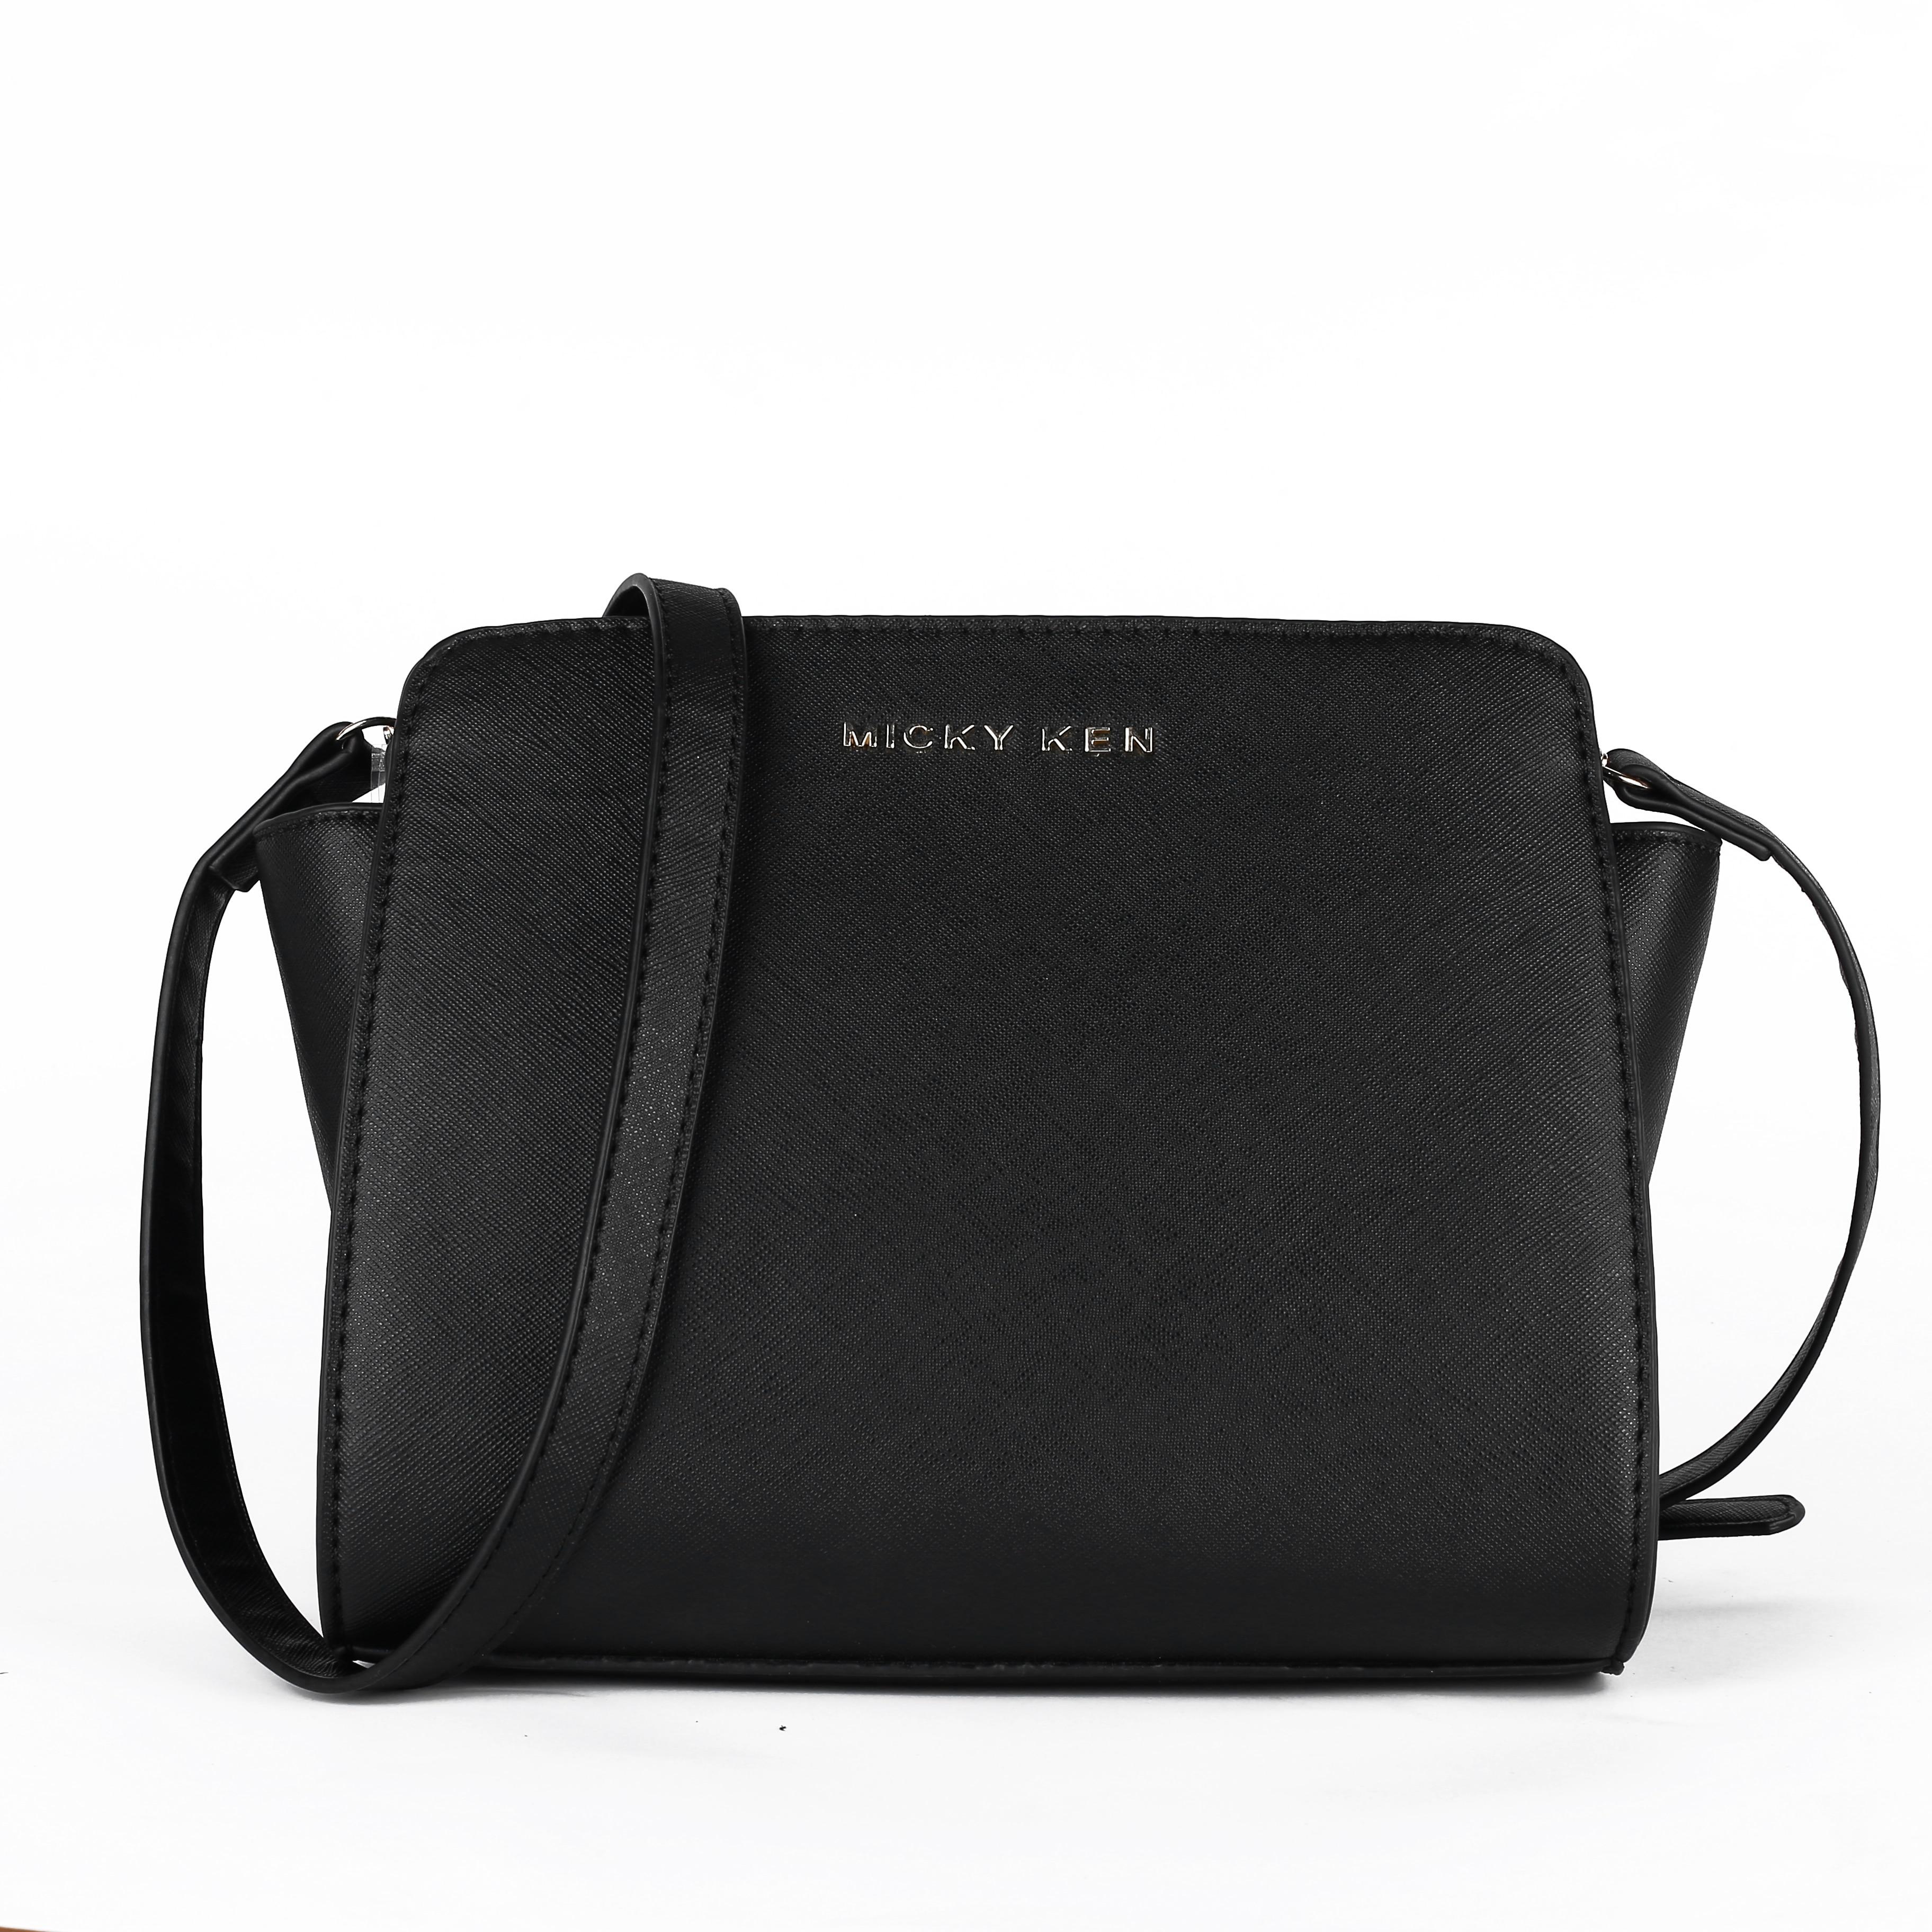 2019 Elegant PU Leather Shoulder Bag Women Designer Luxury Handbags Women Bags Messenger Crossbody Woman Zipper Messenger Bag